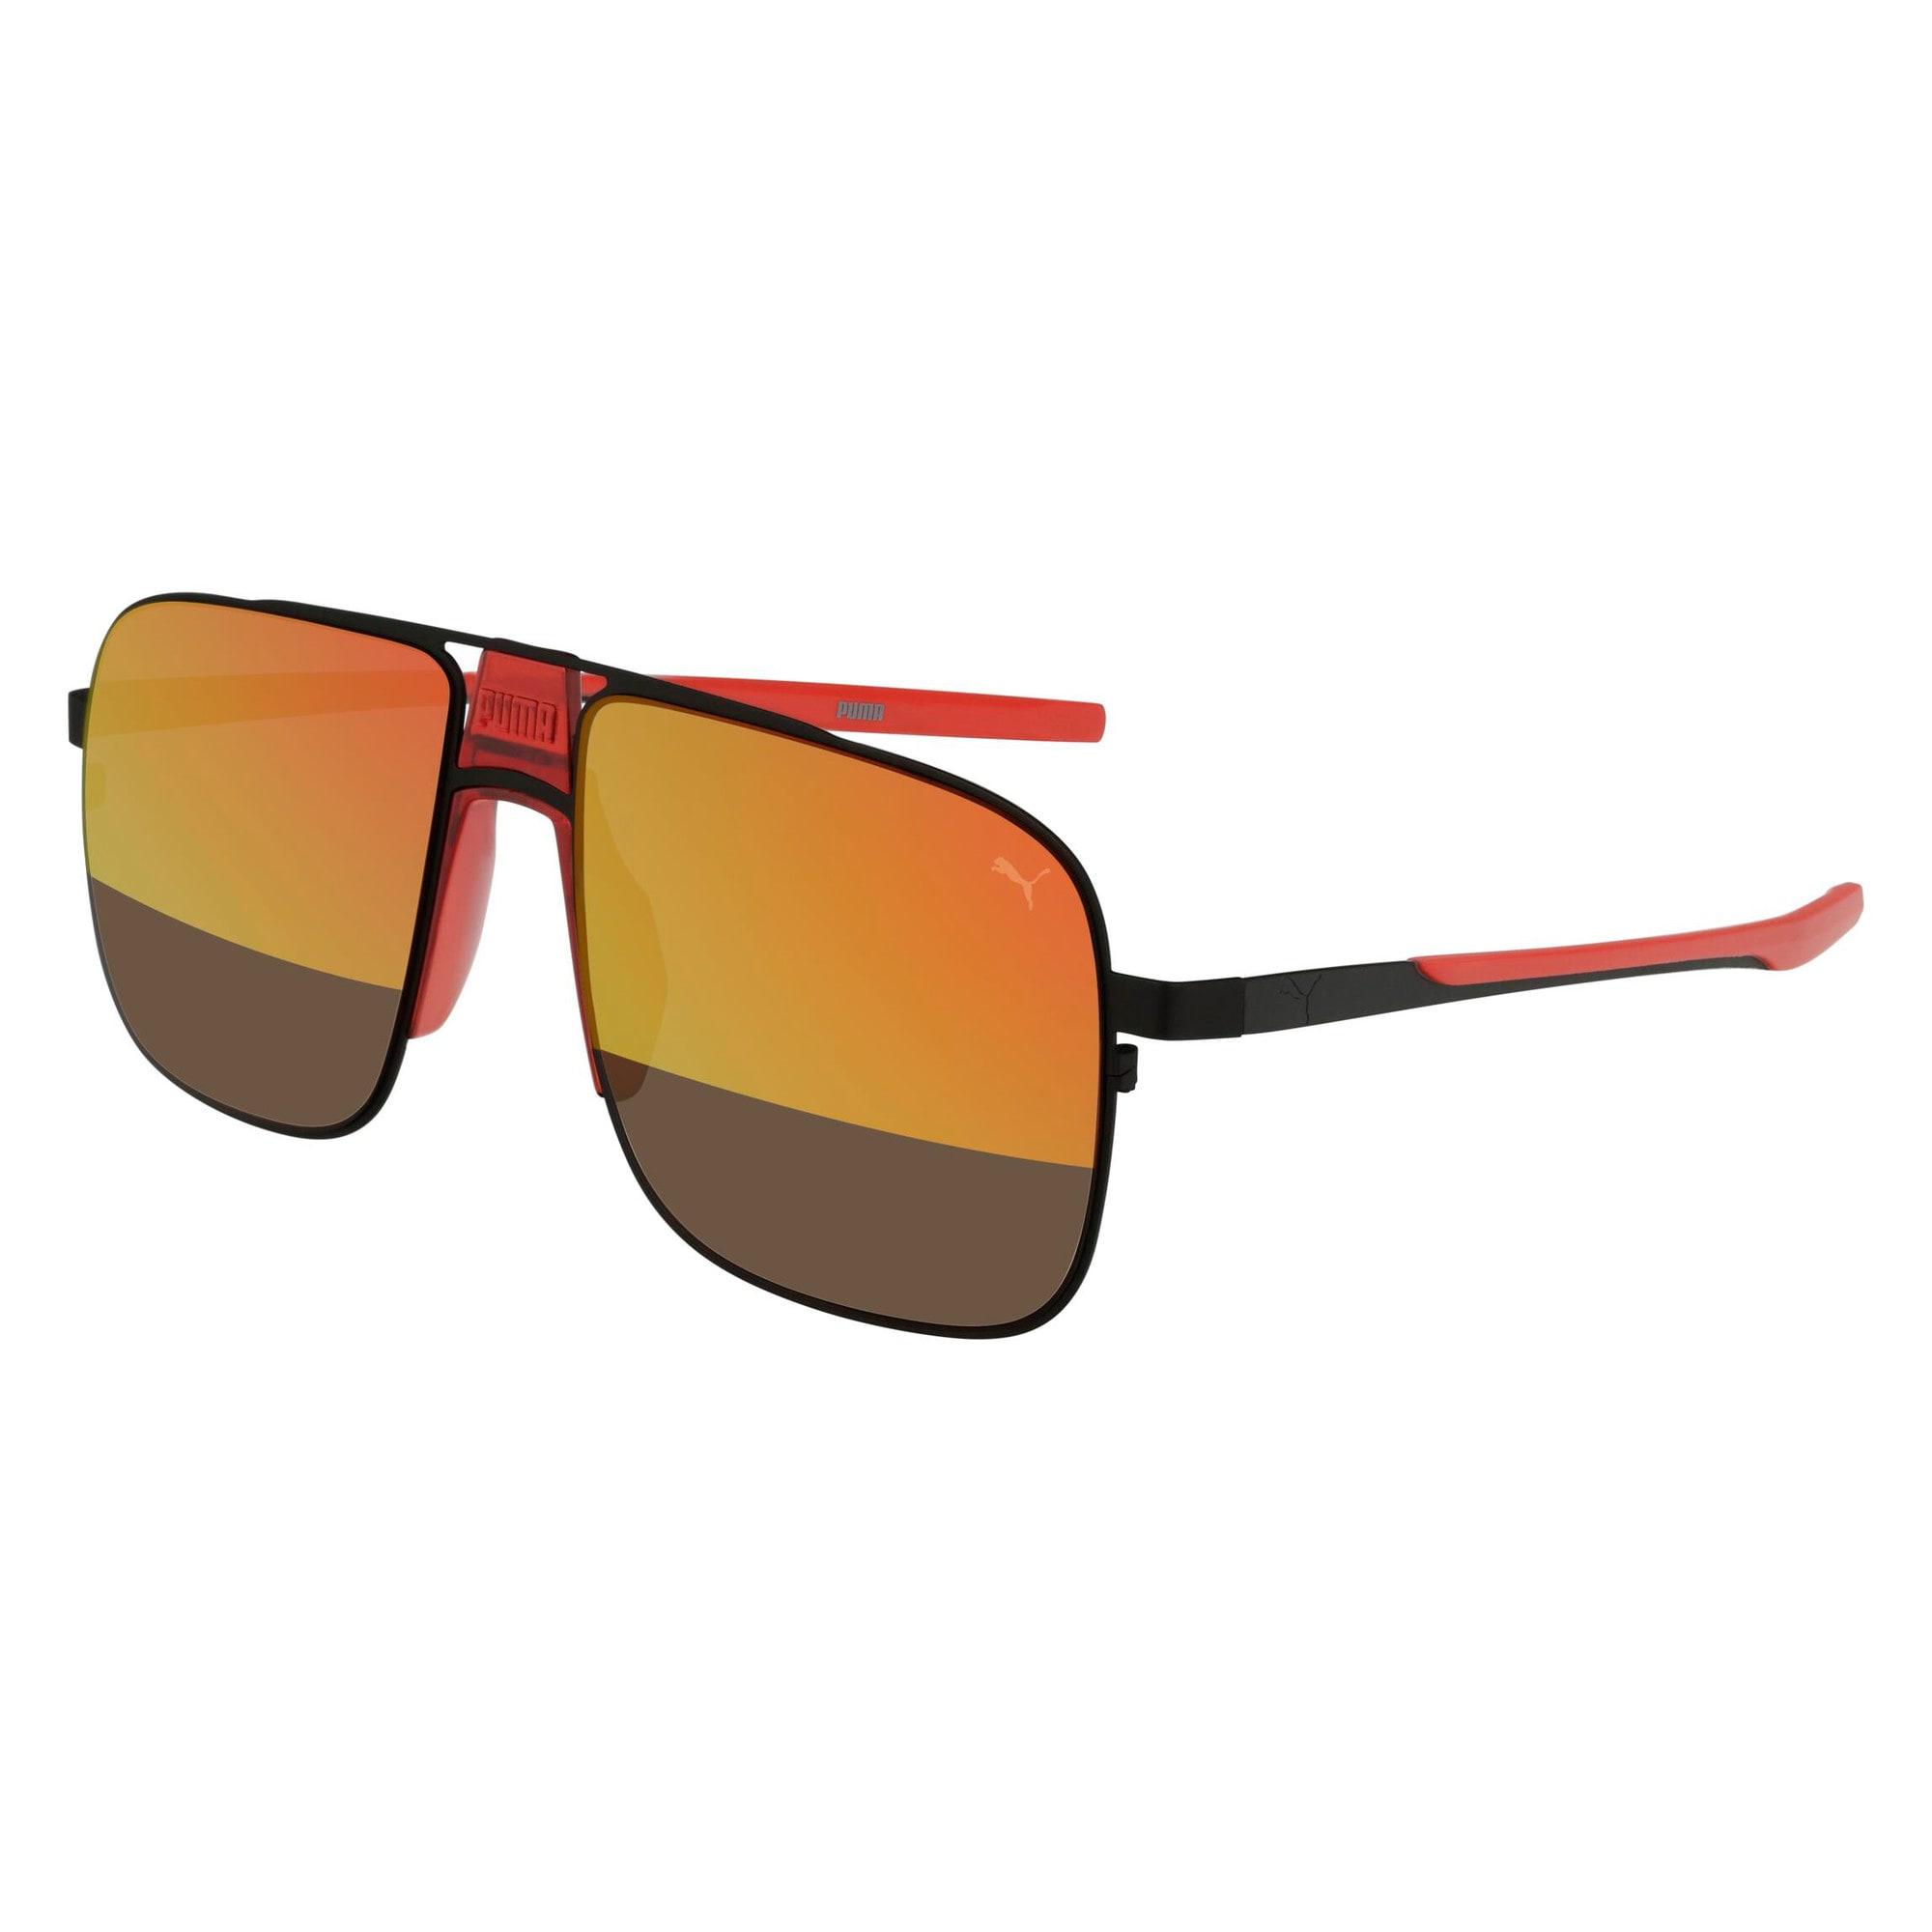 Thumbnail 1 of Lookout Sunglasses, BLACK, medium